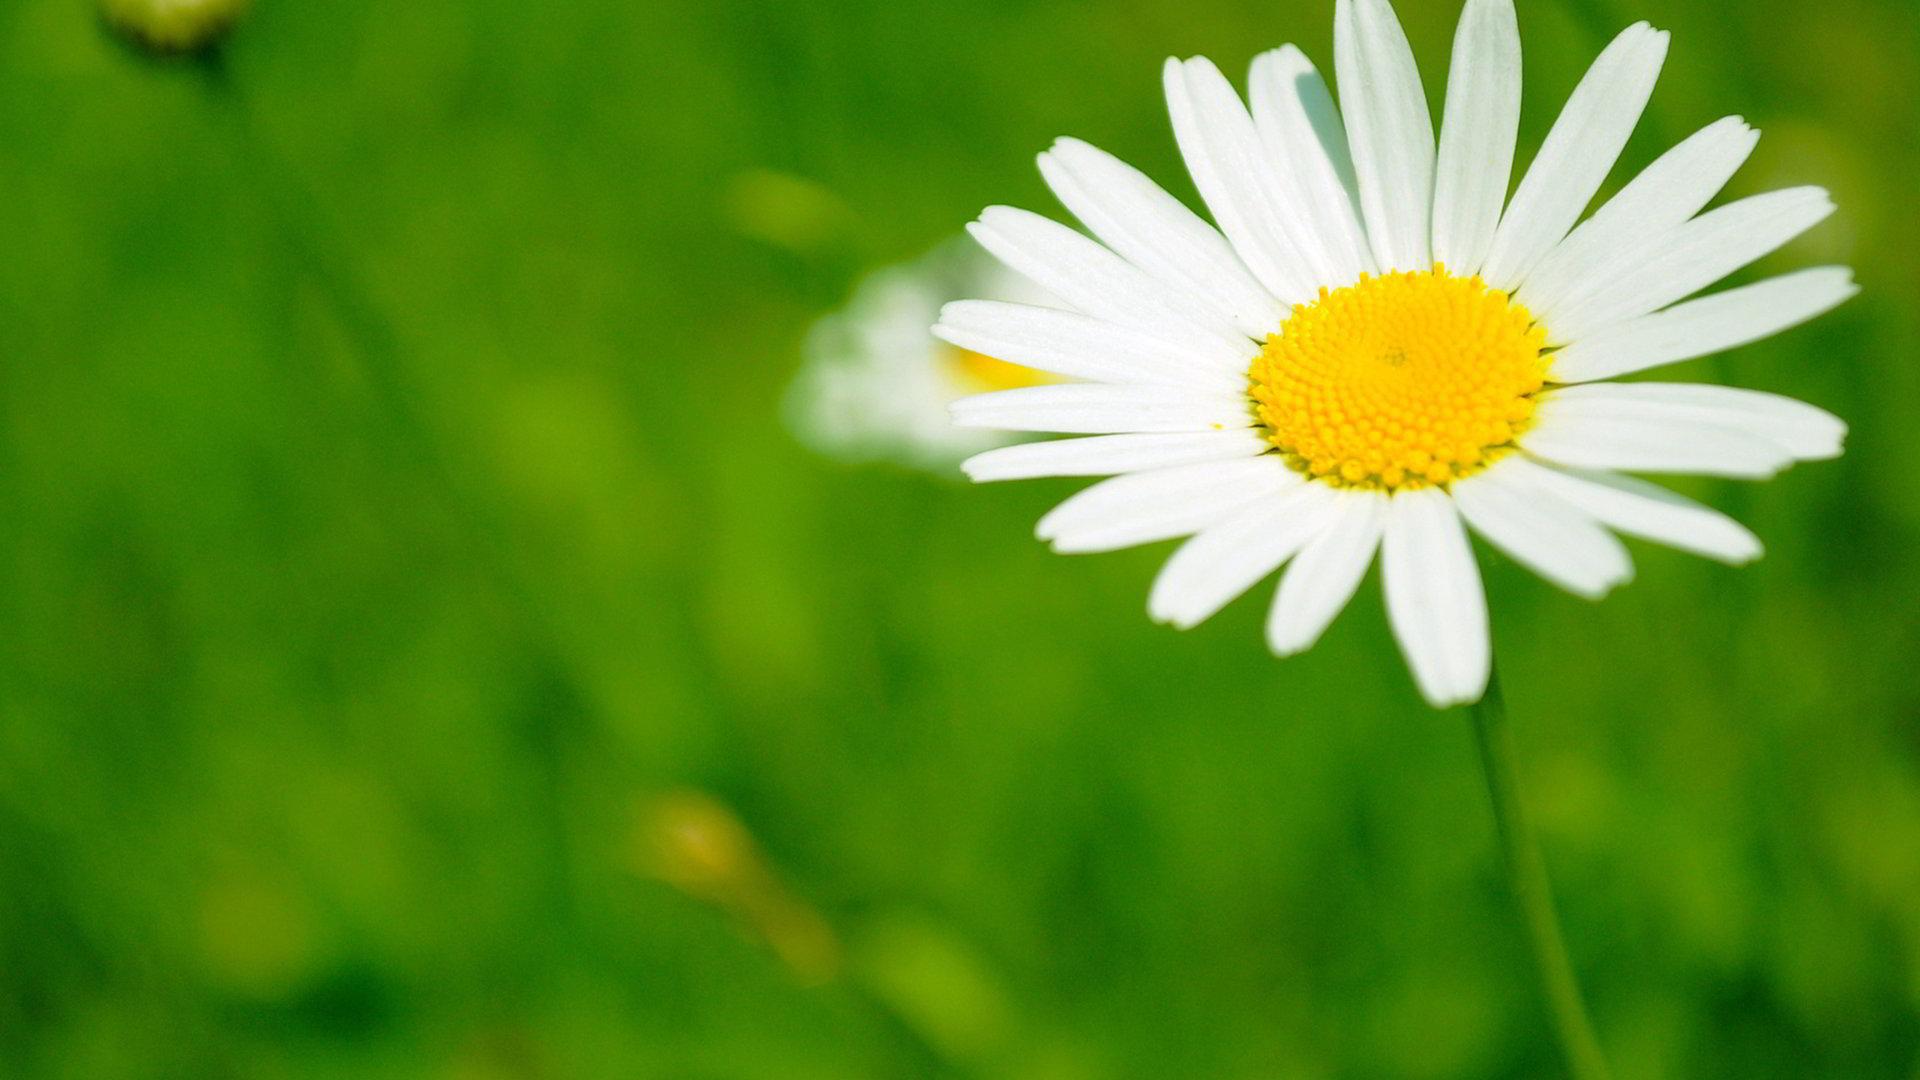 hinh anh hoa cuc dep 29